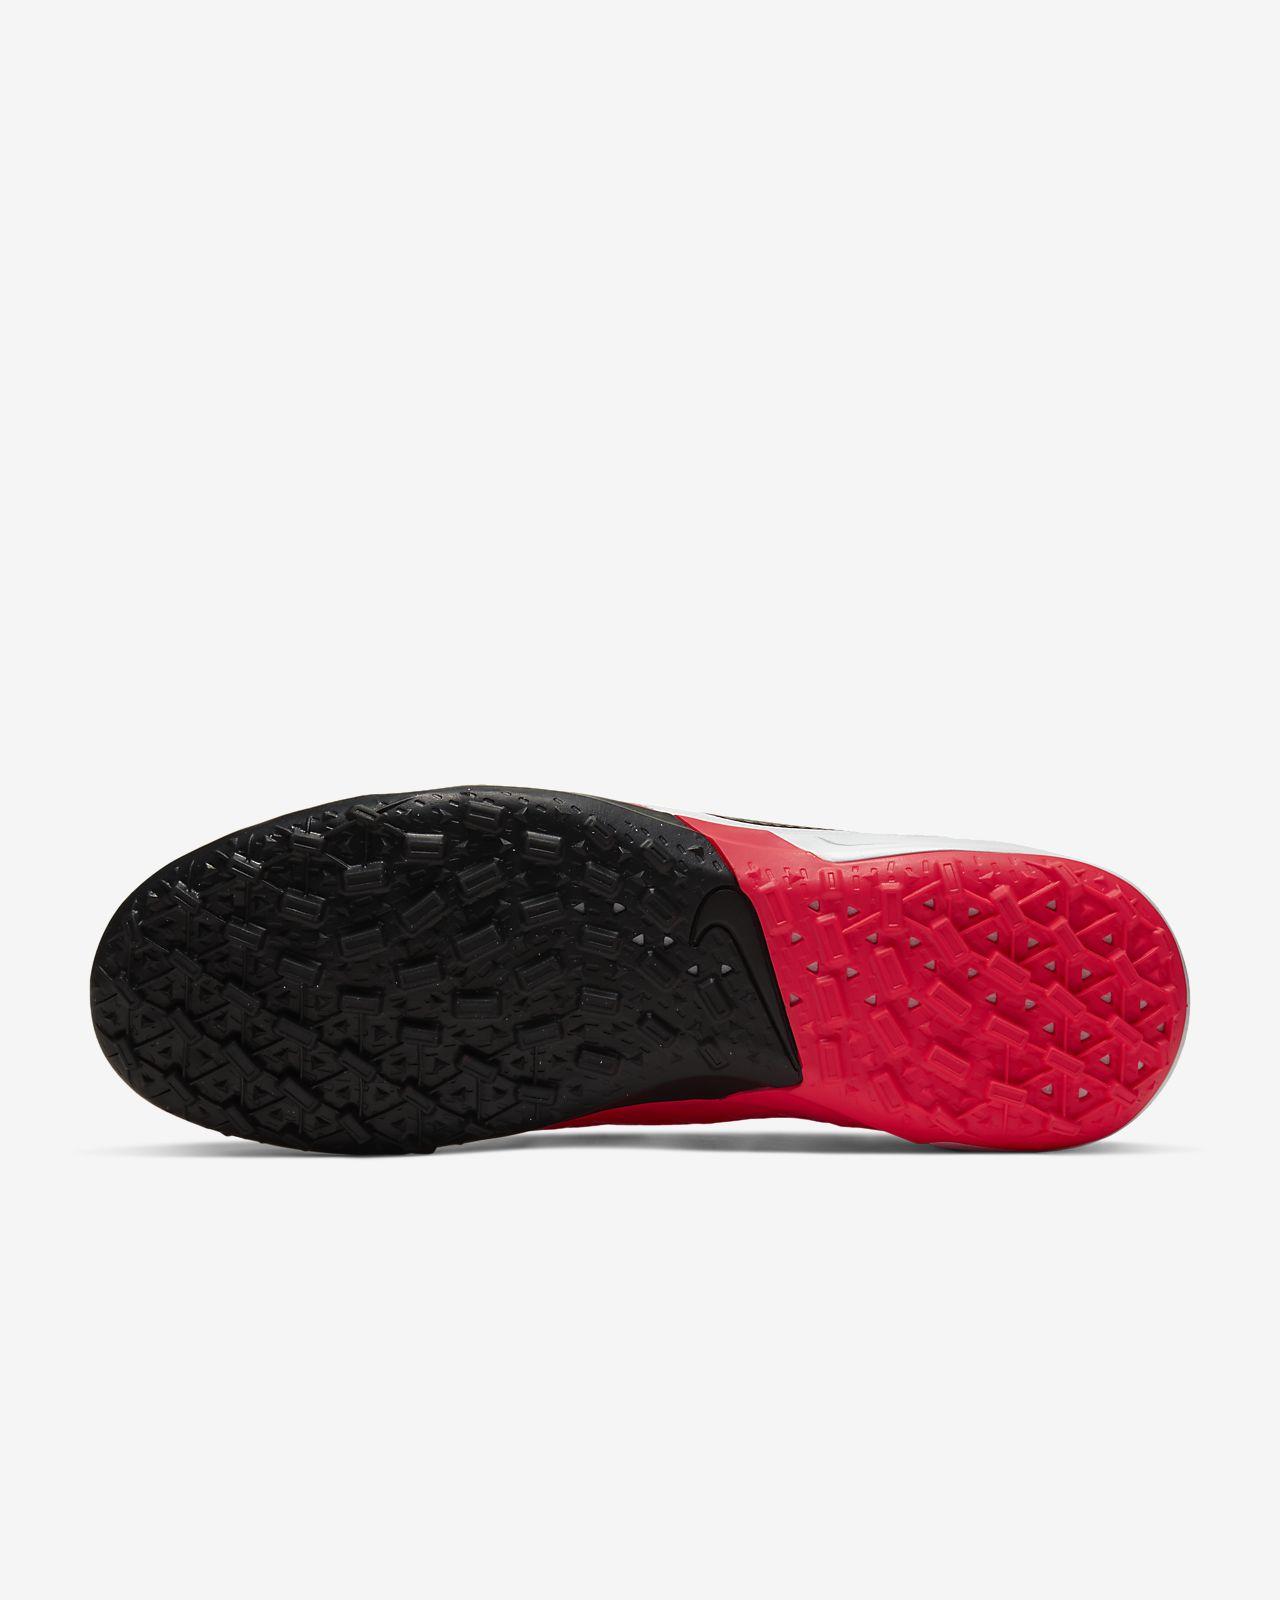 Nike Tiempo Legend 8 Academy TF Artificial Turf Football Shoe